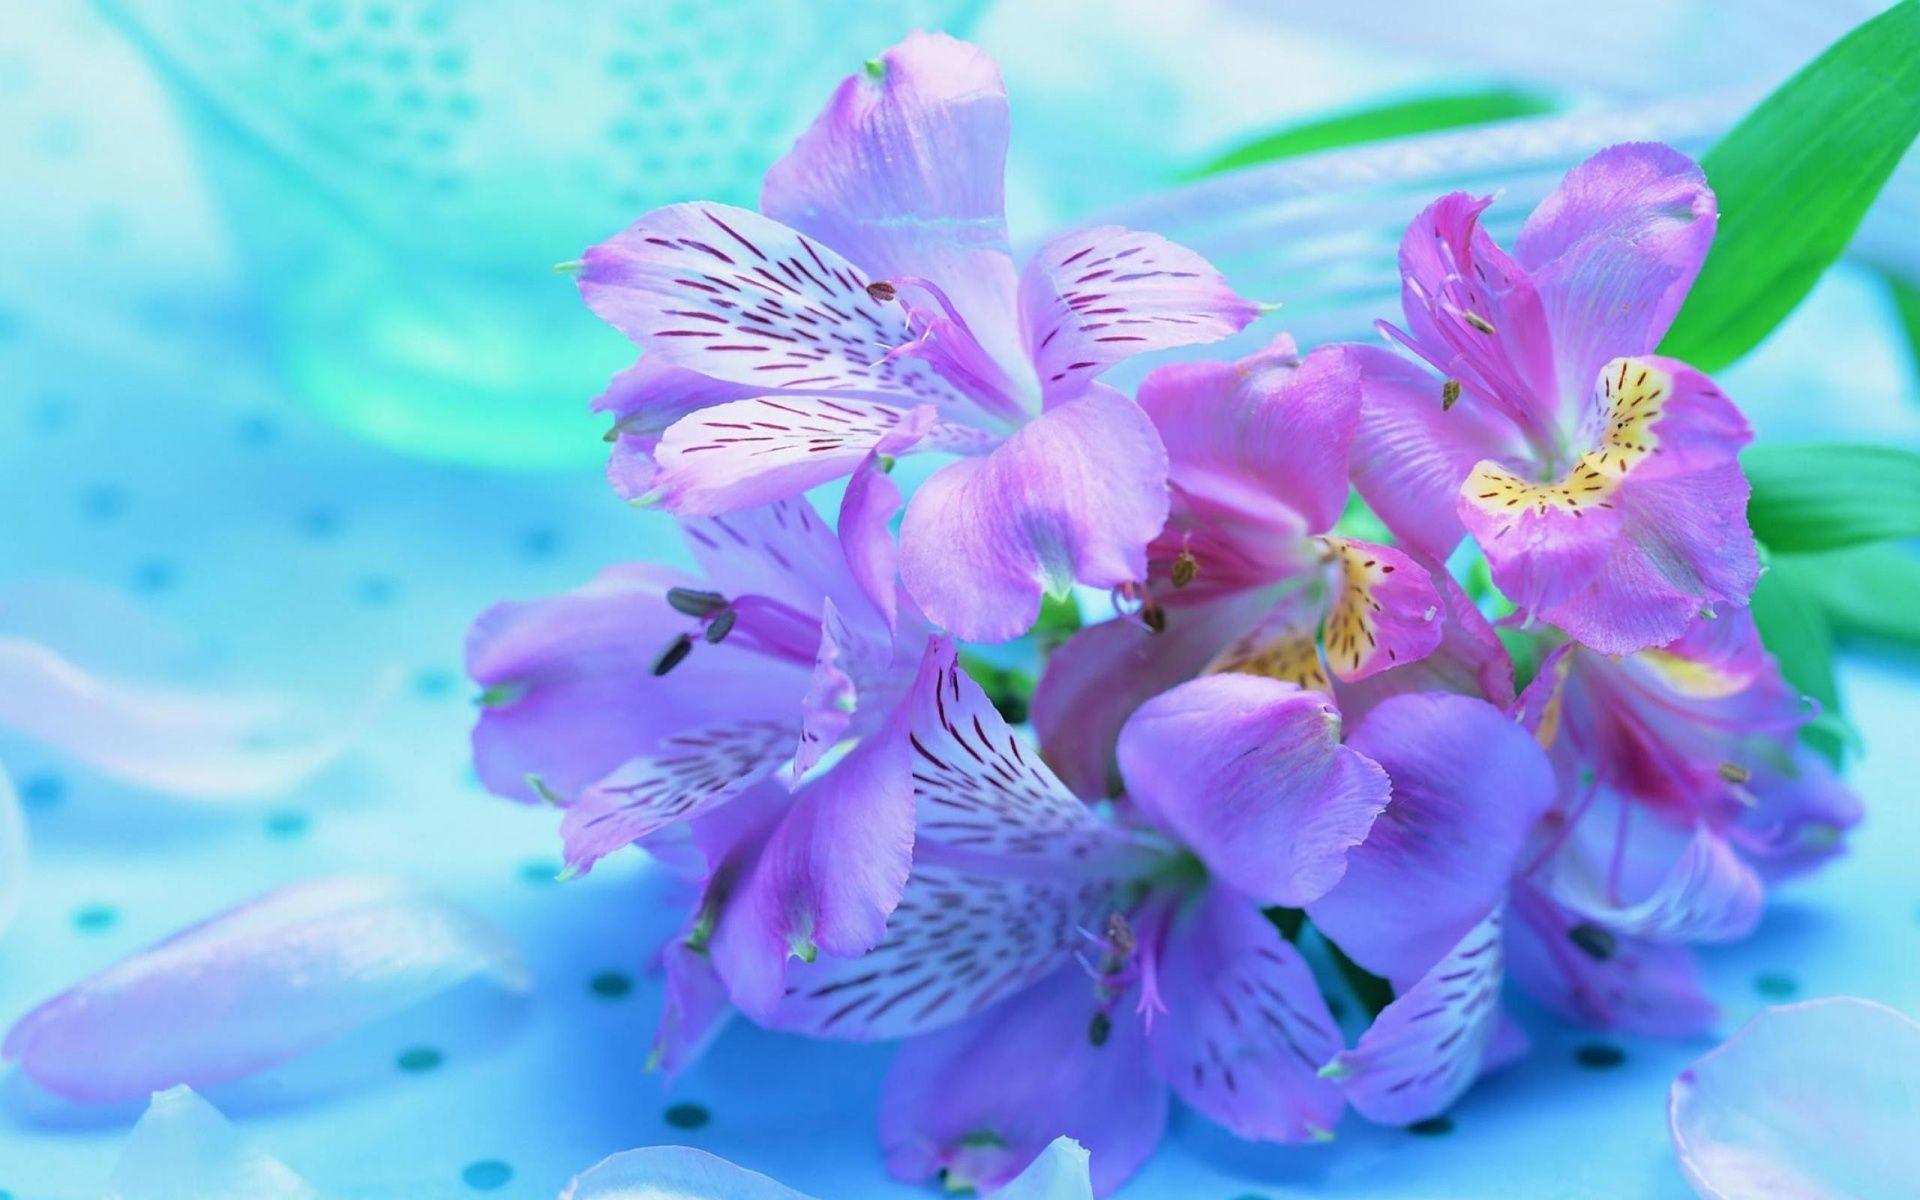 Pretty Flower Wallpaper (49+ images)